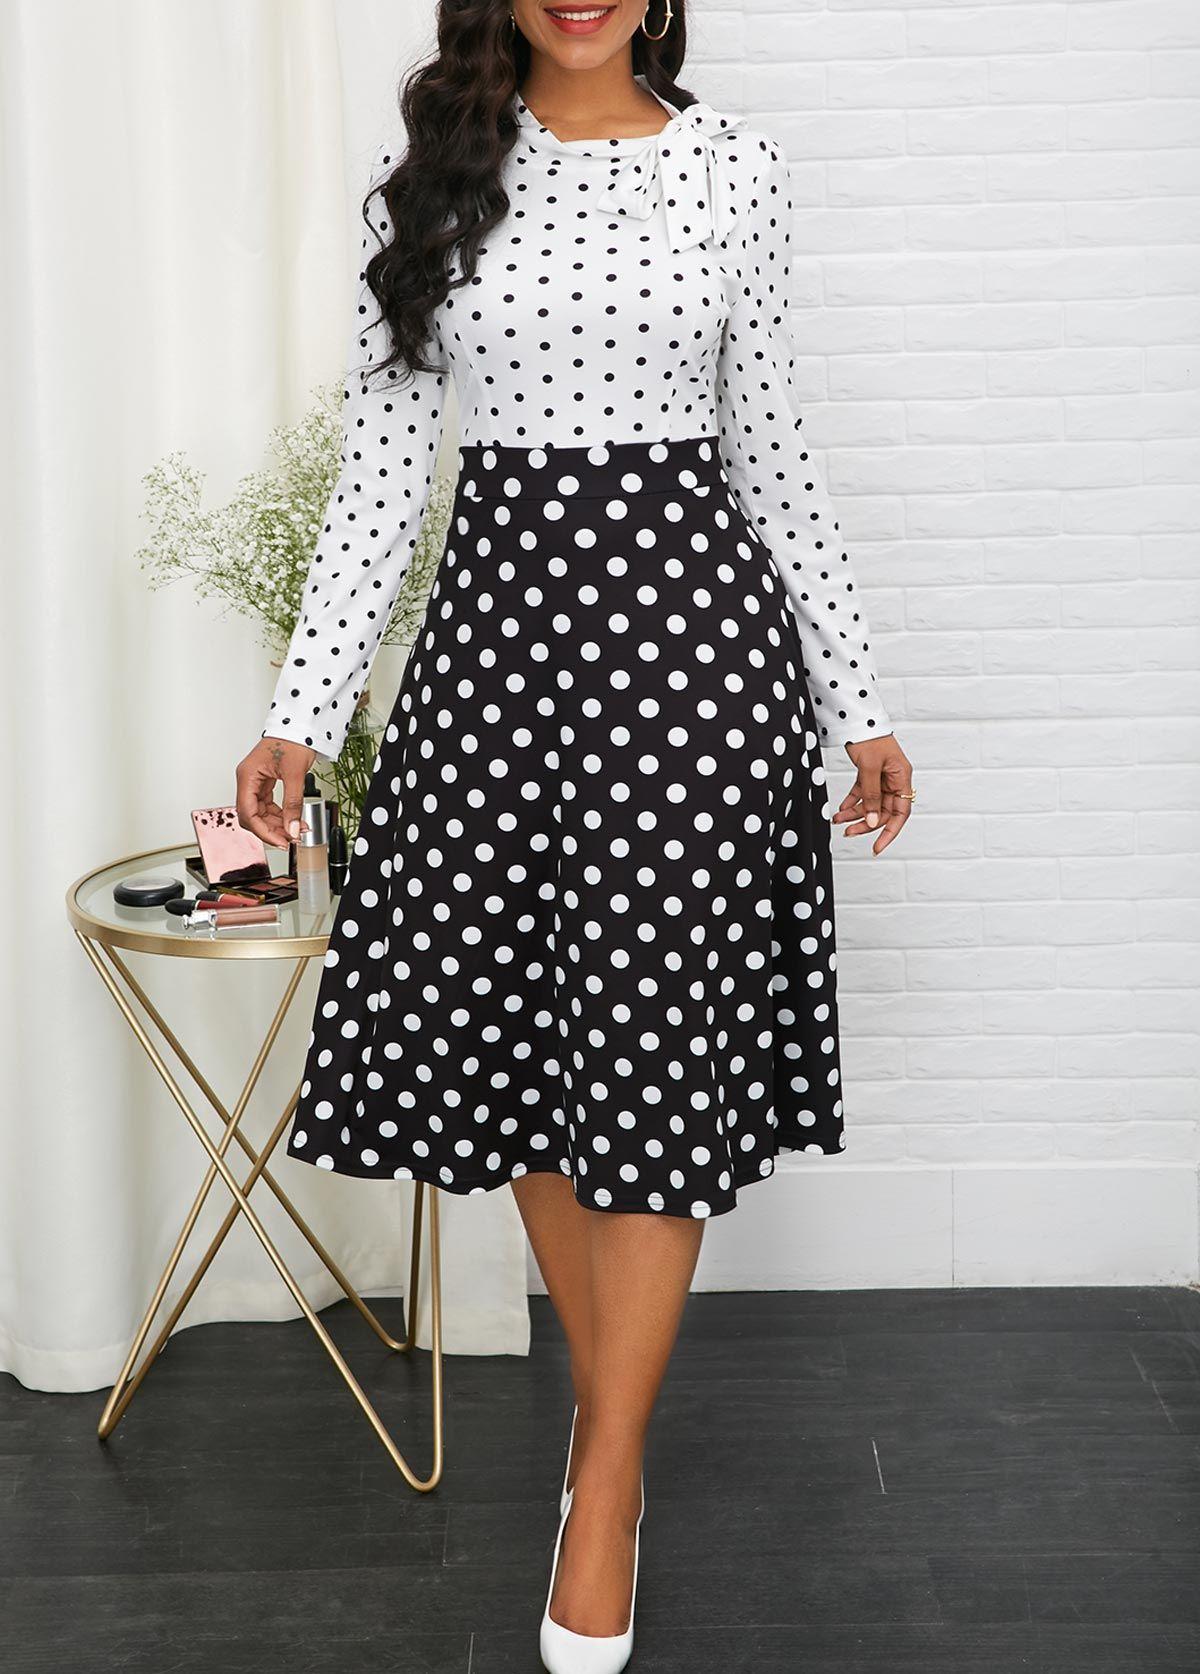 Long Sleeve Bowknot Detail Polka Dot Dress Rotita Com Usd 32 78 Classy Dress Dot Dress Outfit Formal Dresses Classy [ 1674 x 1200 Pixel ]